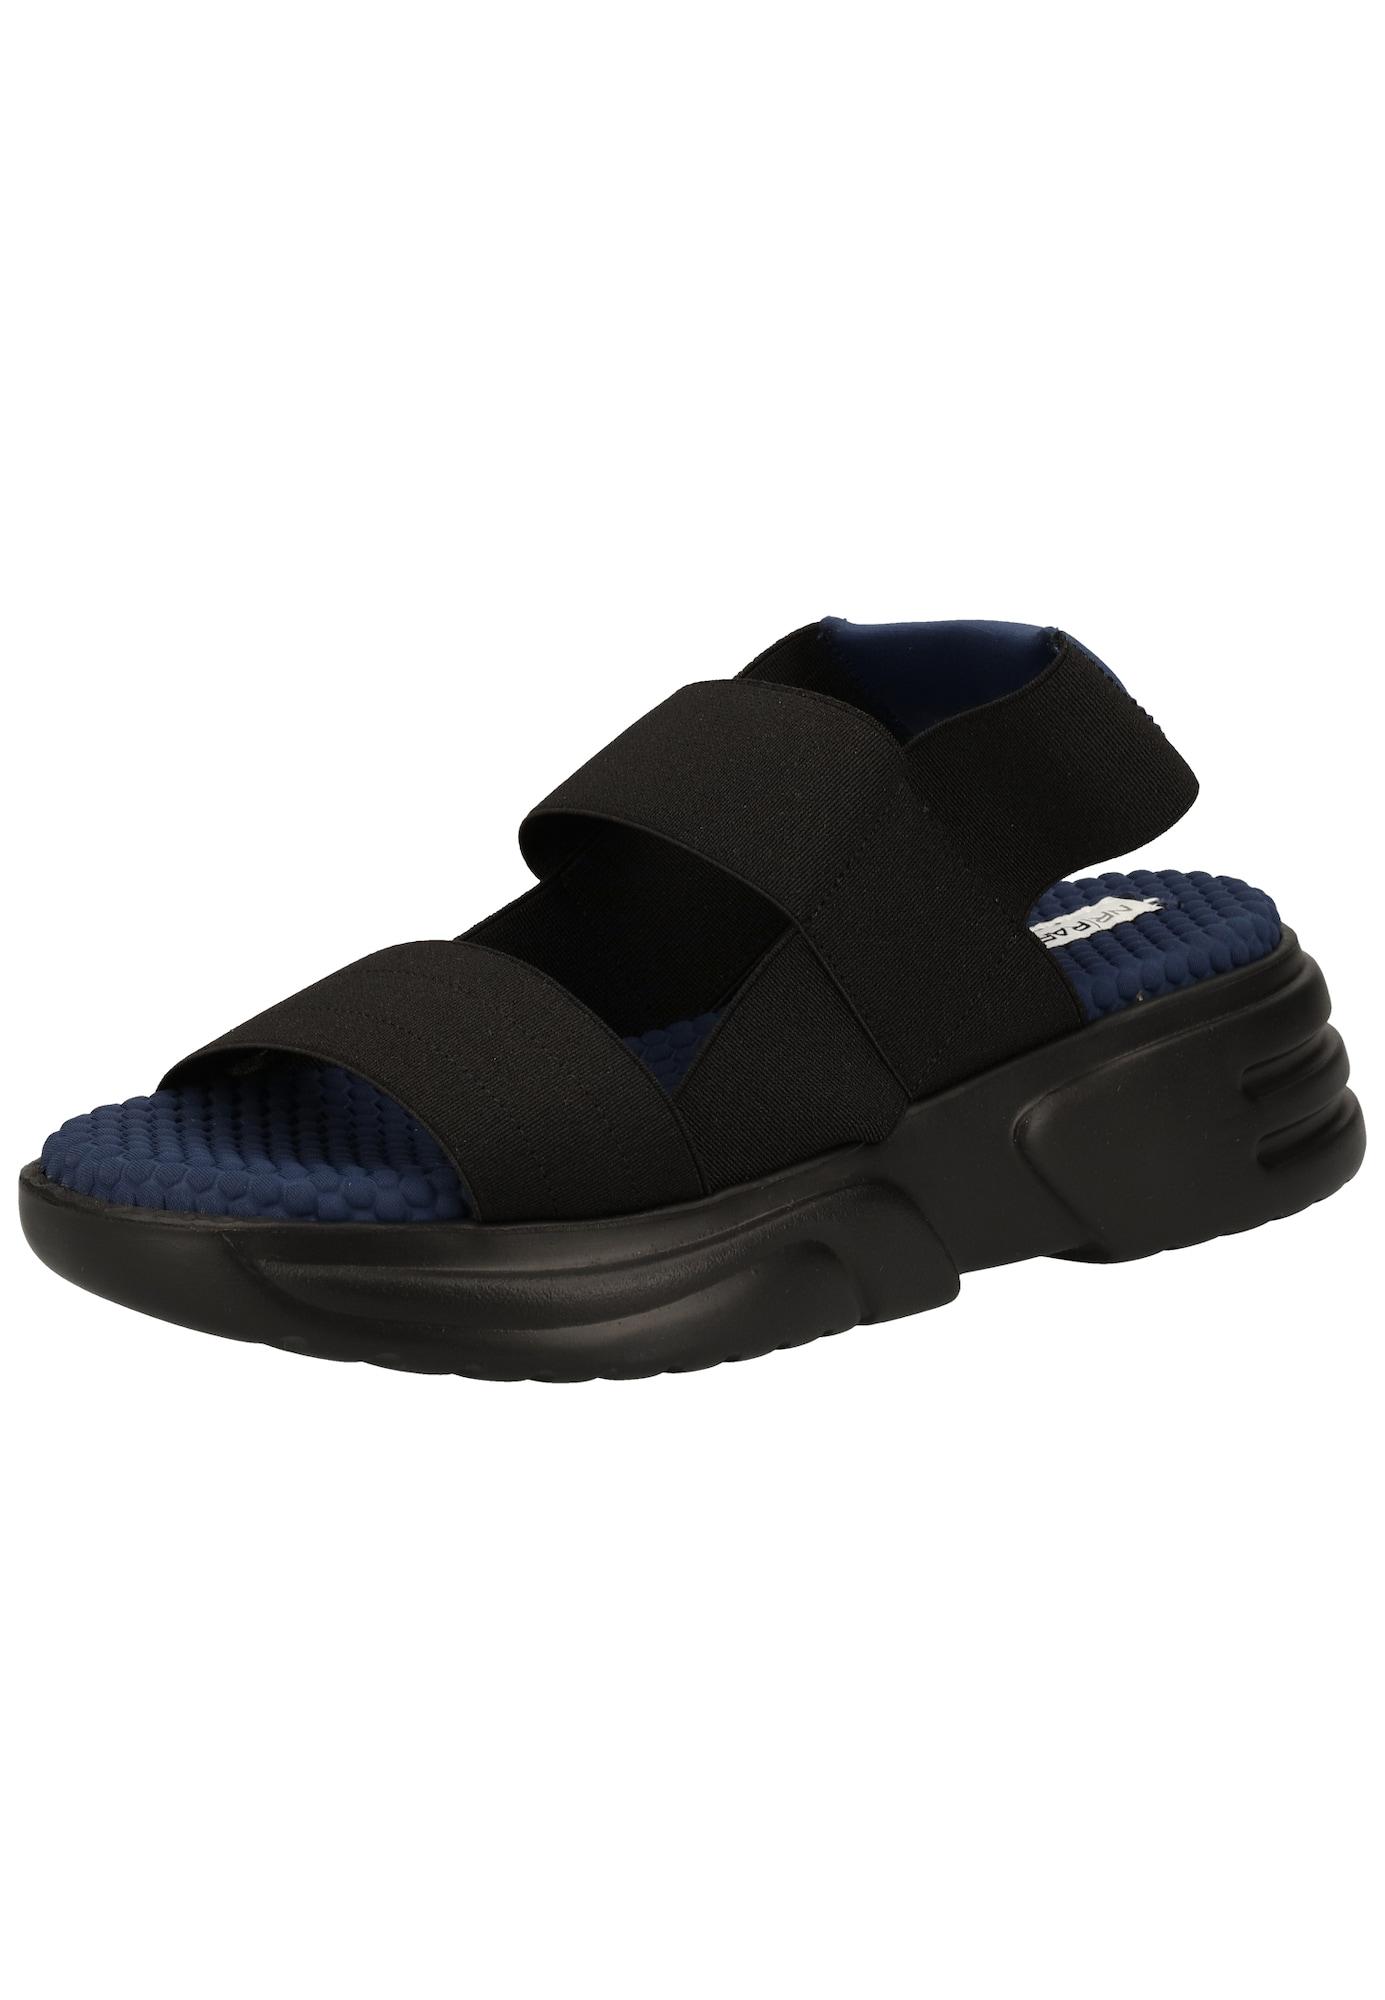 Riemensandale | Schuhe > Sandalen & Zehentrenner | Rapisardi